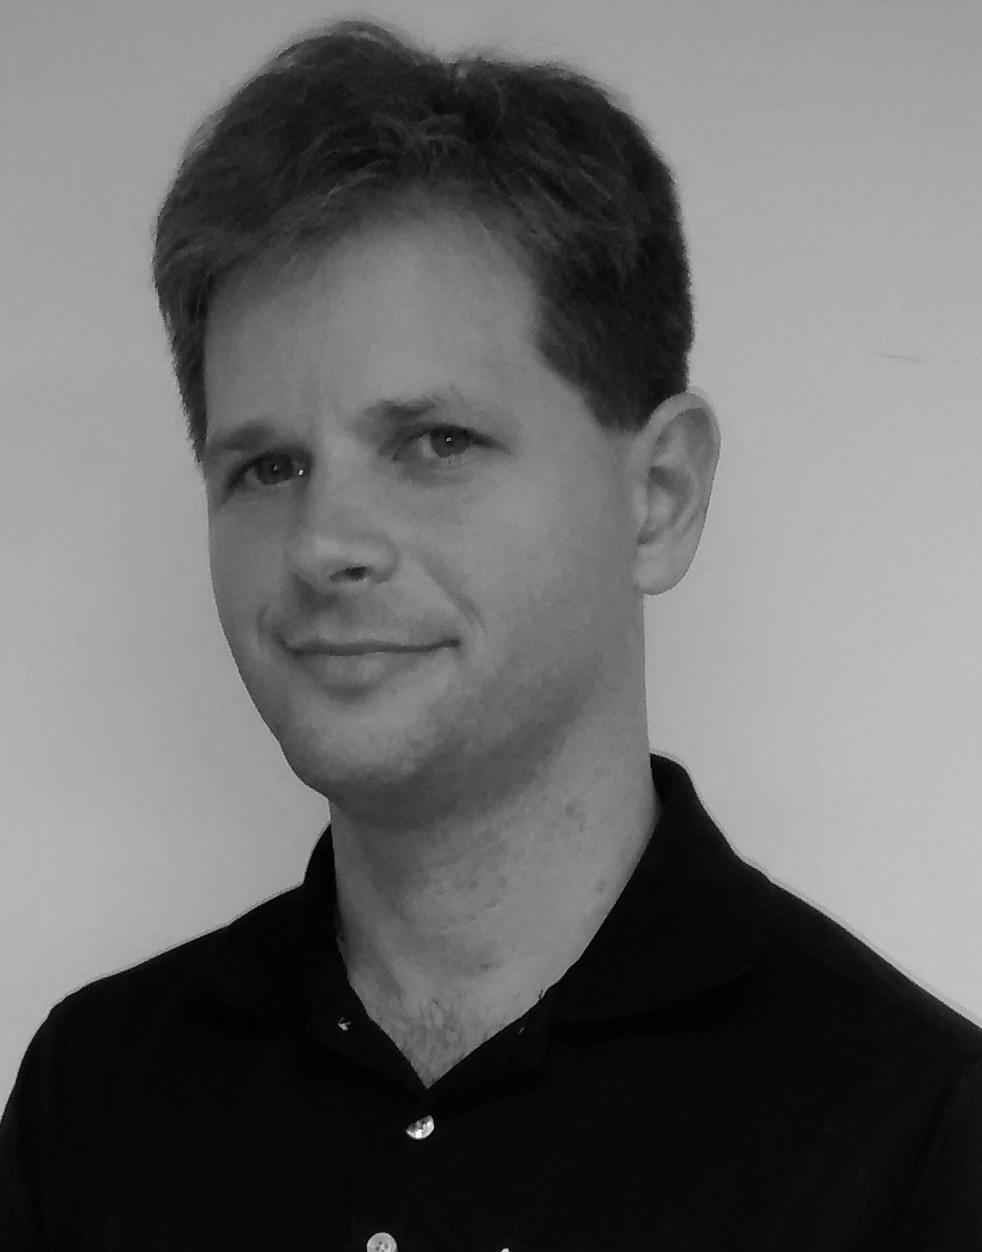 Leandro Fernandes de Almeida, XRF and XRD Application Specialist, Malvern Panalytical